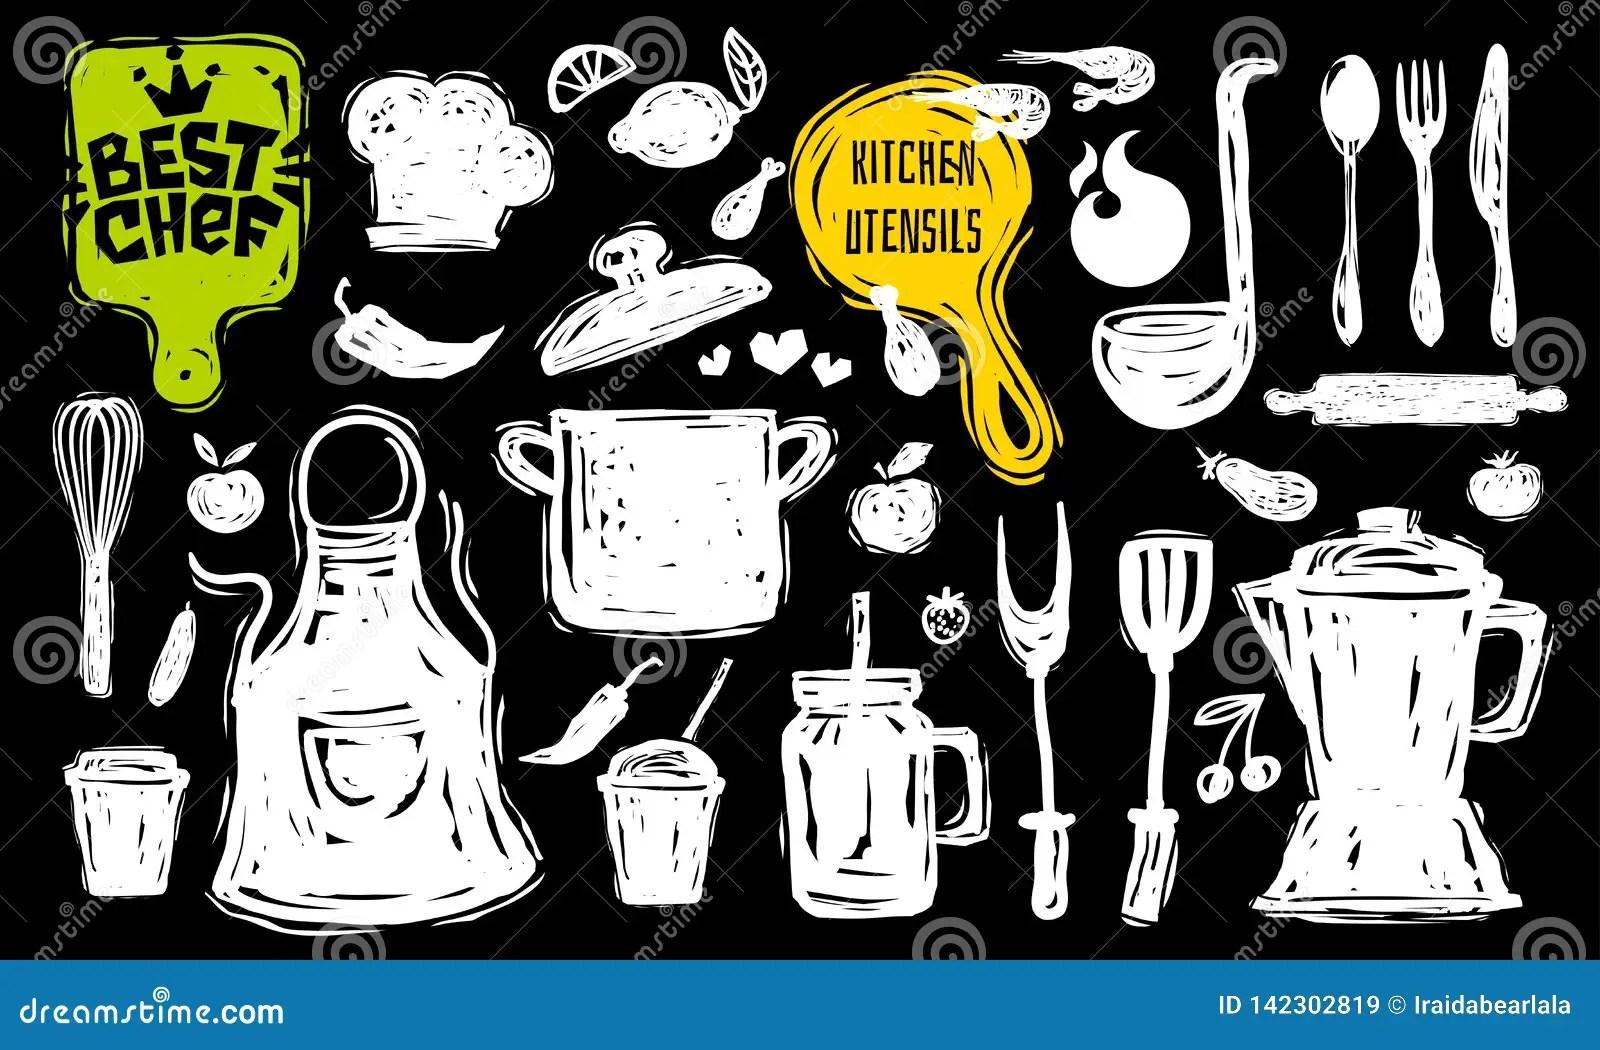 Best Chef Culinary School Logo Design Label Sticker Poster